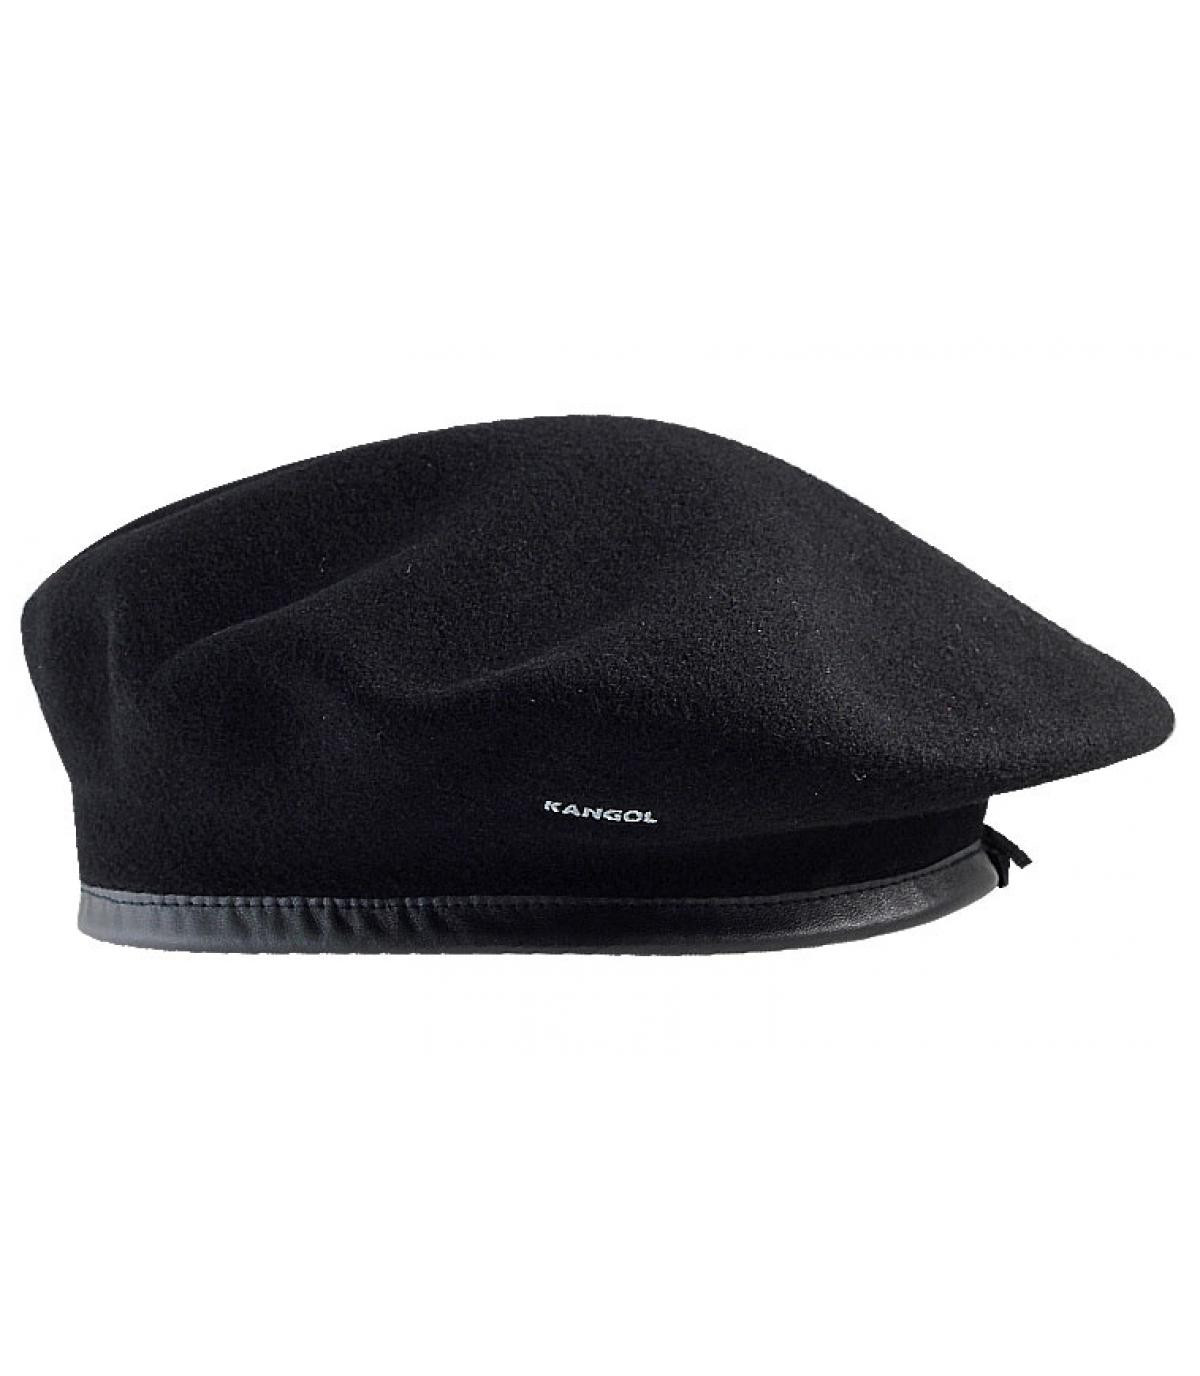 f9c8493b767 Kangol Beret Hats HD Wallpapers – Home design